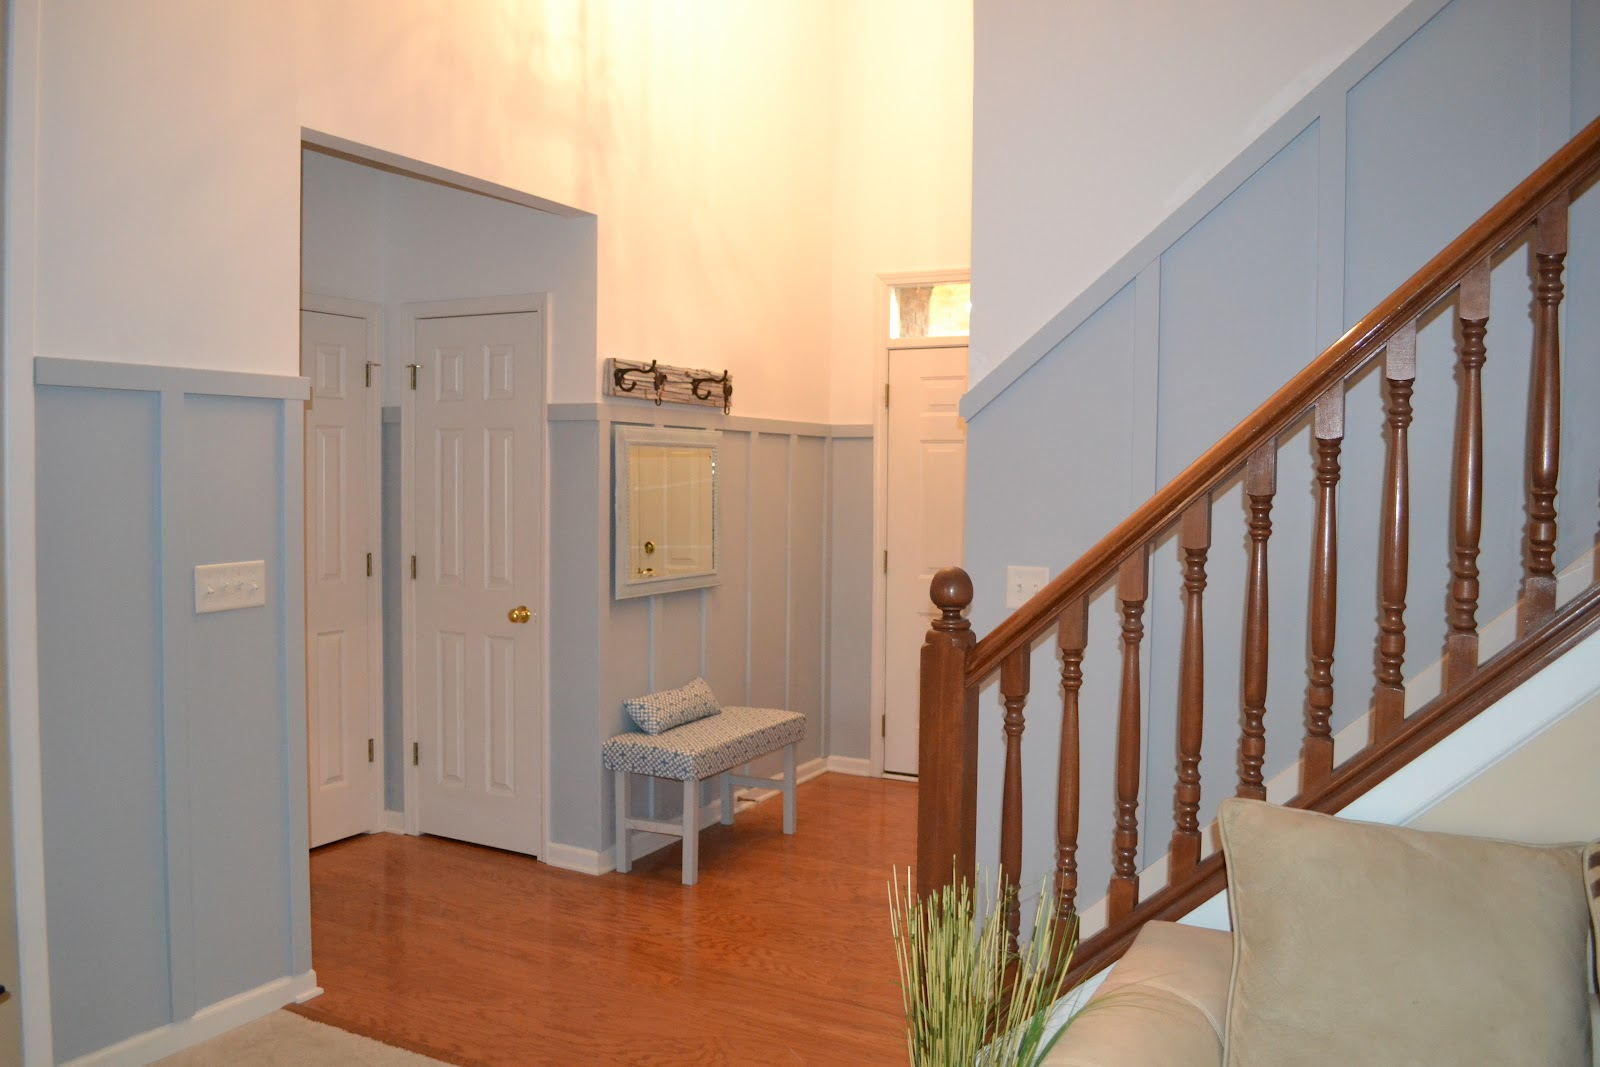 Tda Decorating And Design Stairwell Board Amp Batten Tutorial